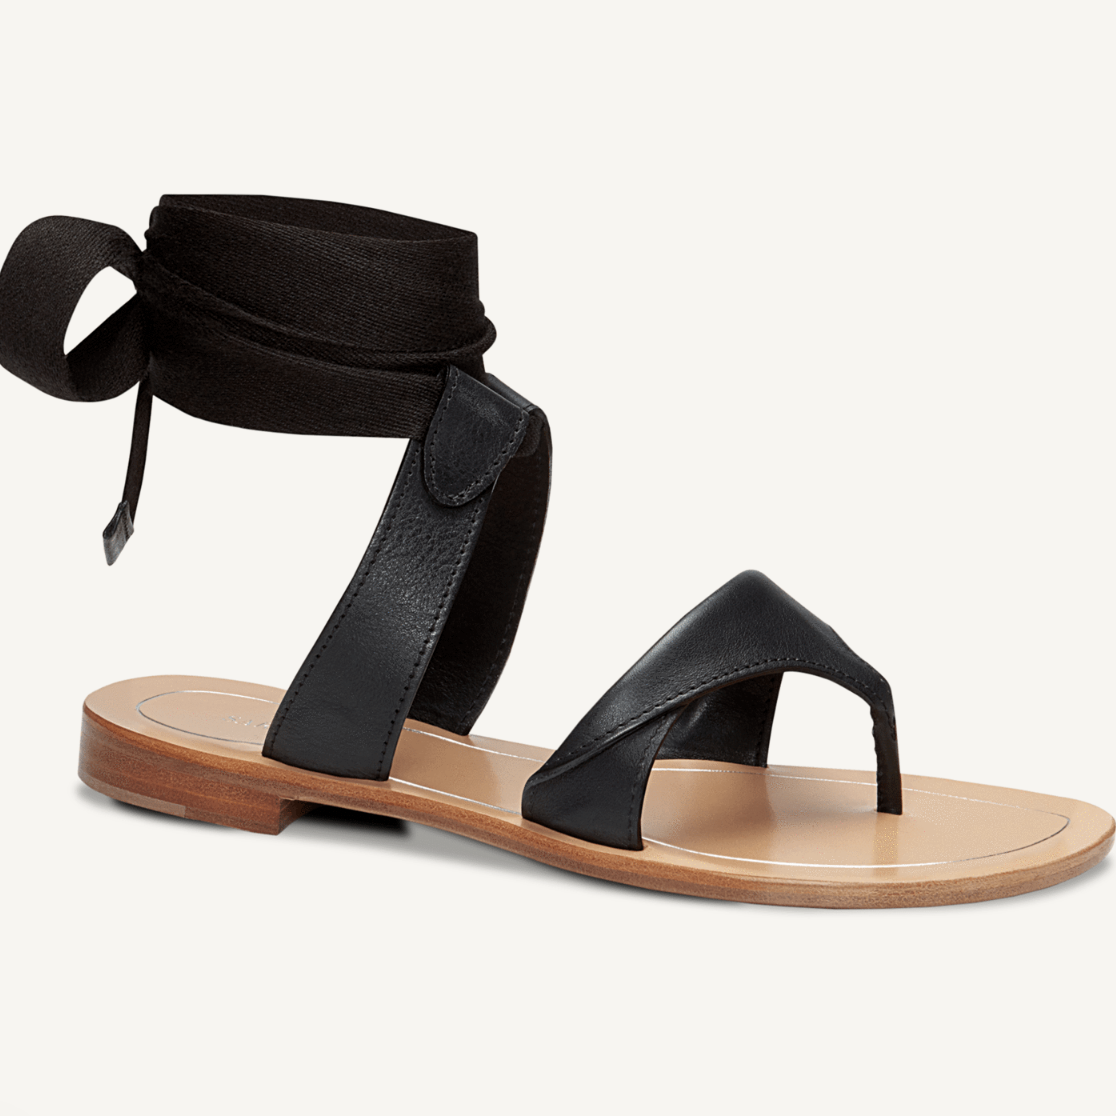 Sarah Flint Grear Sandal 2